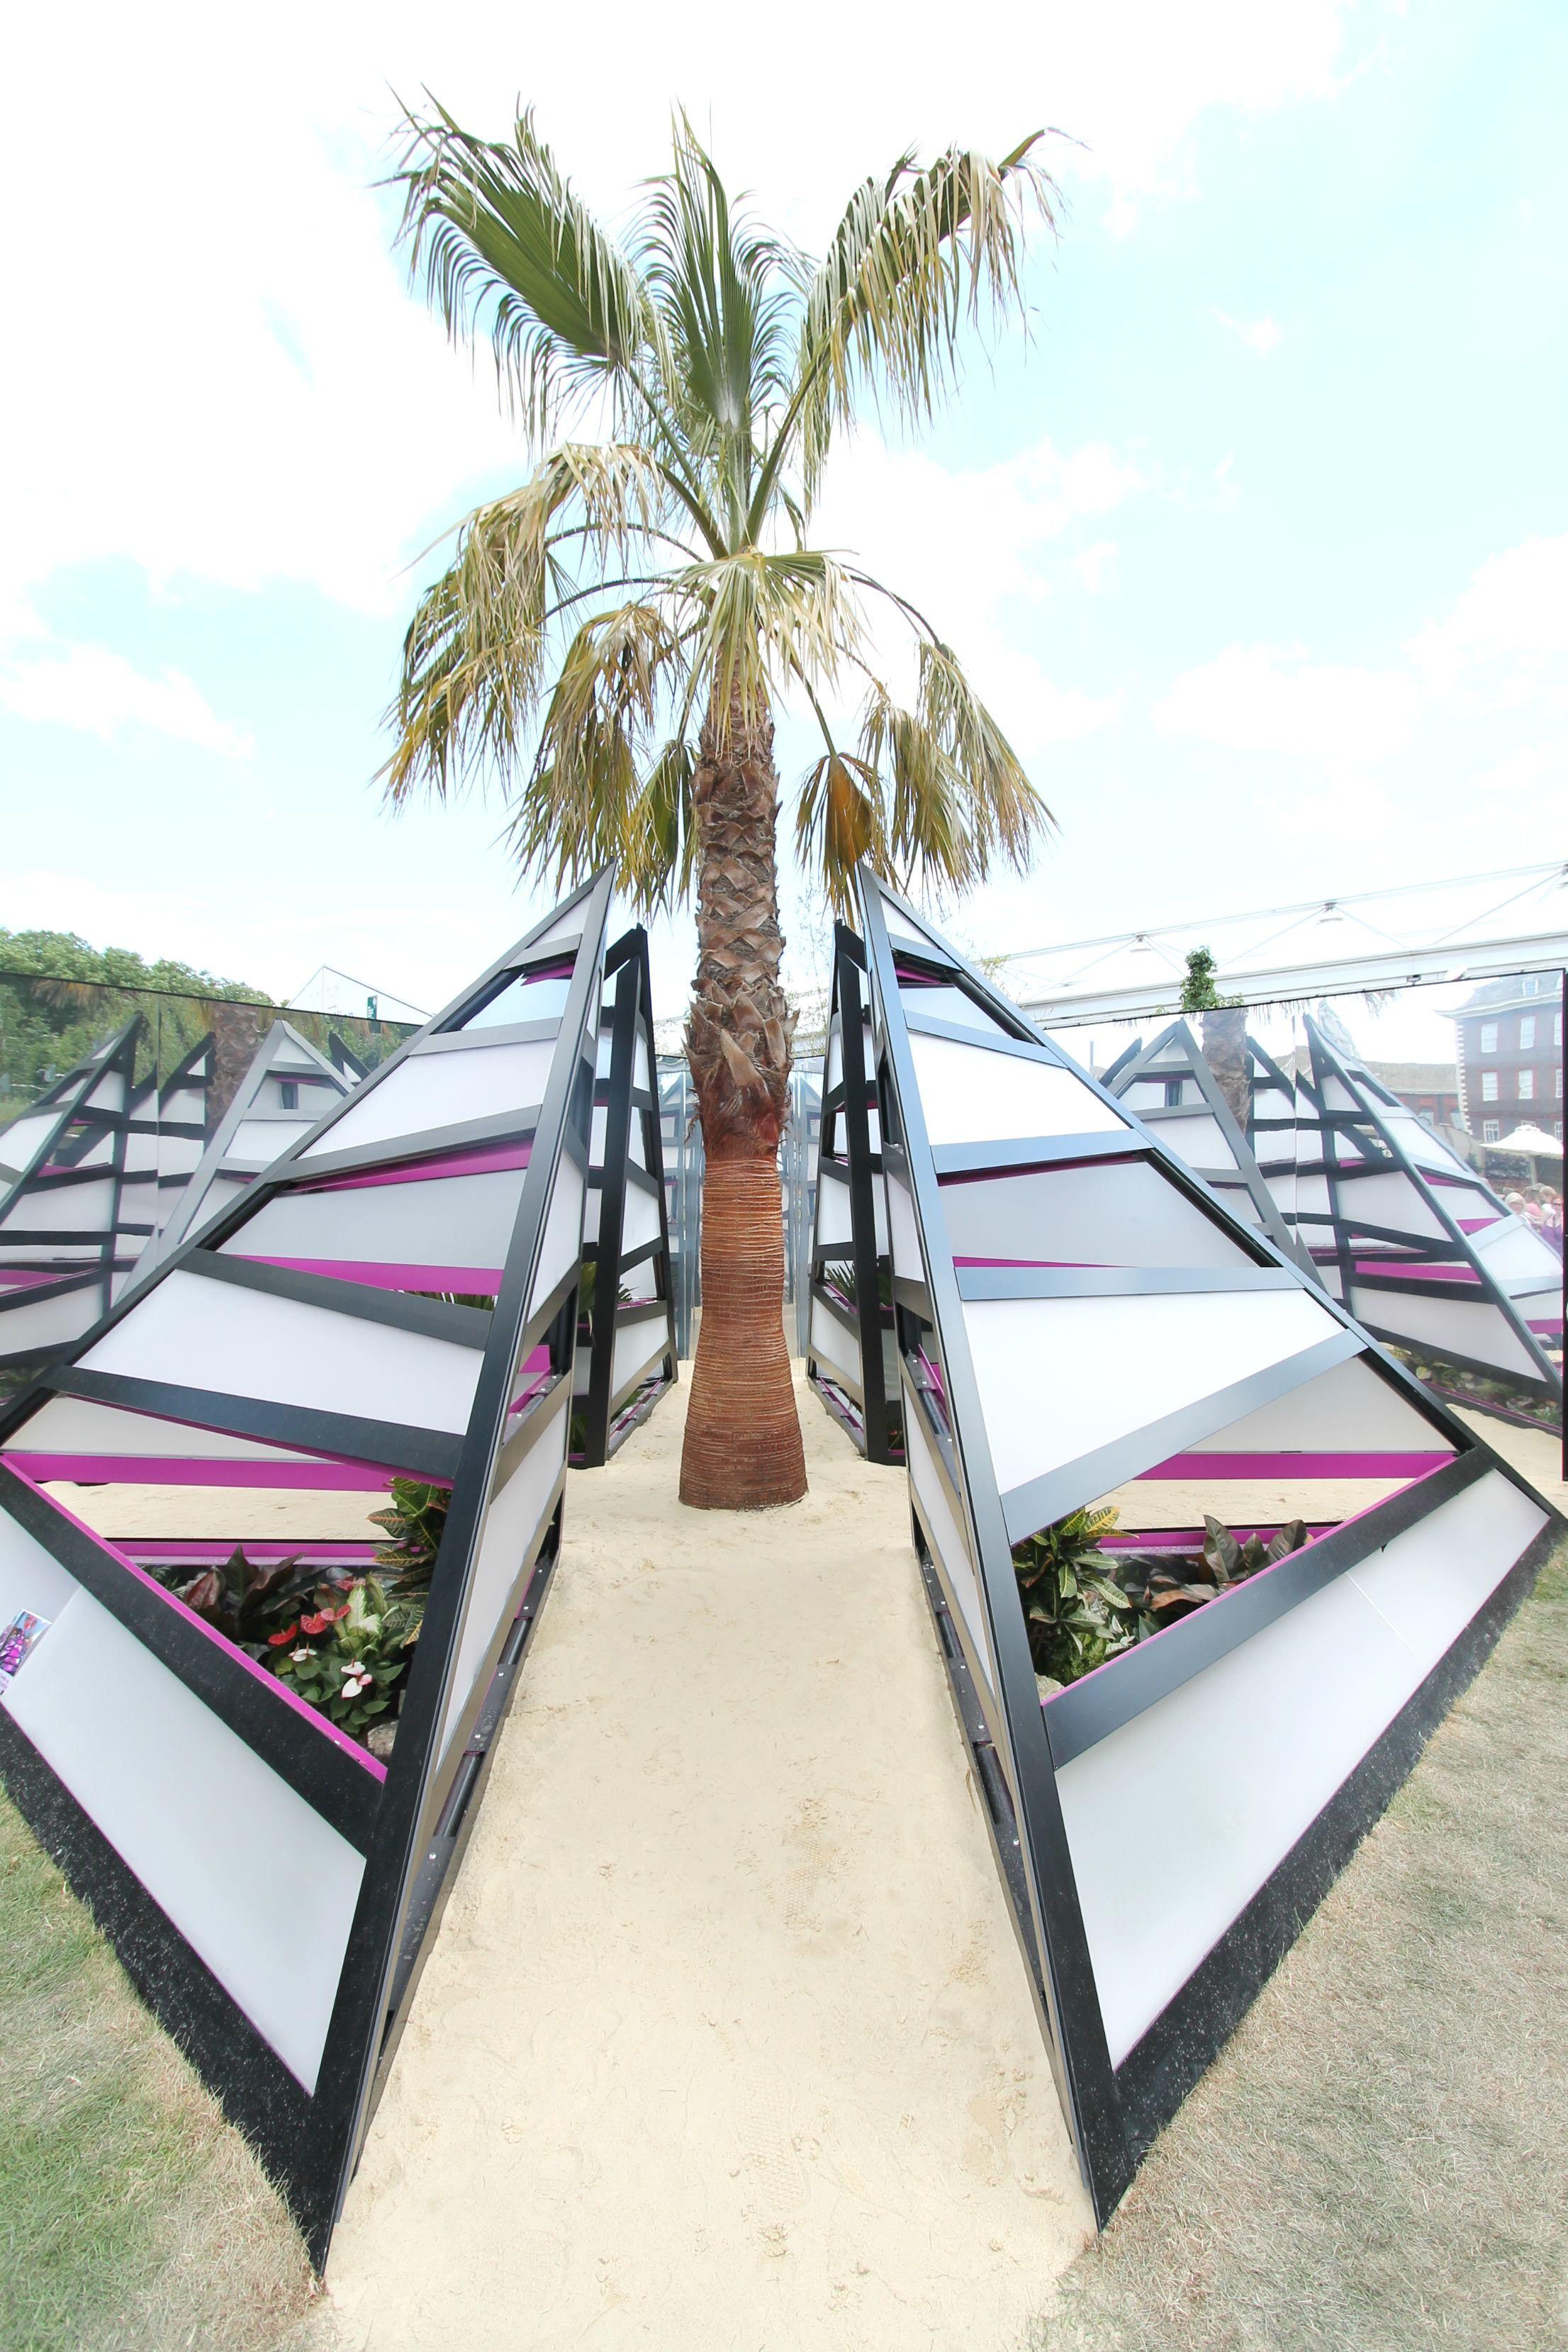 Bermuda Triangle Garden Designed By Jack Dunckley At Rhs Chelsea